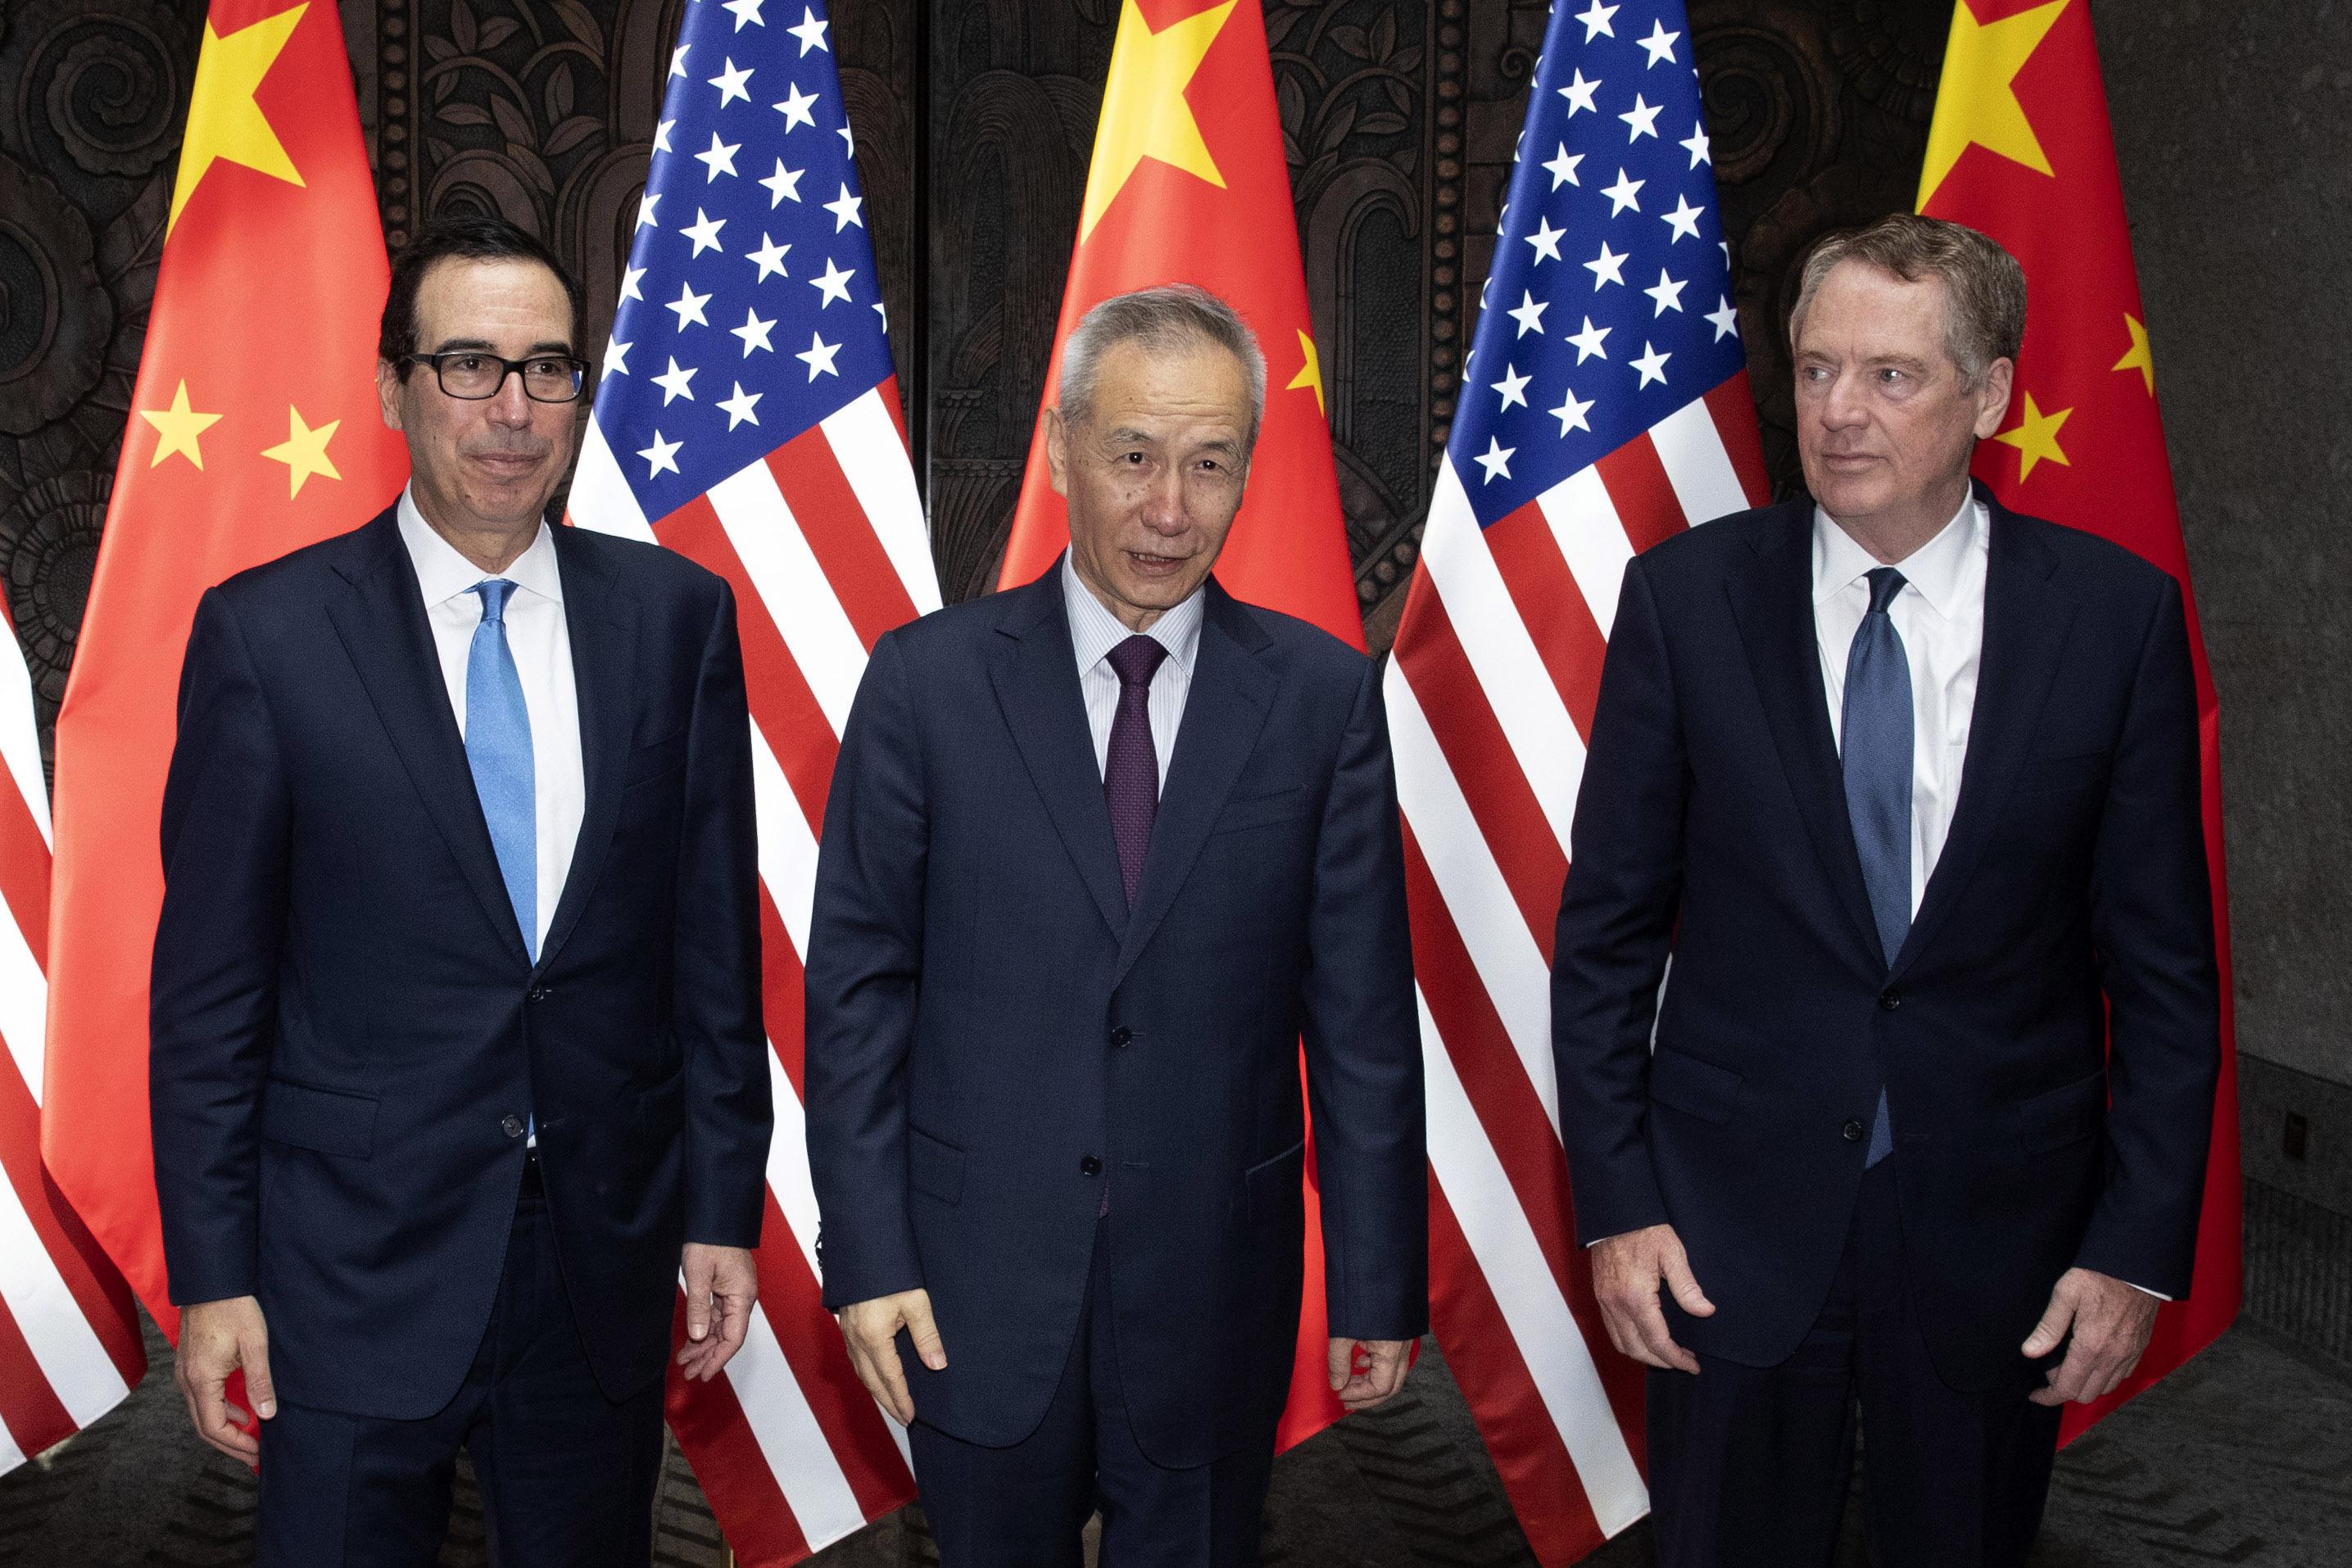 Trump says he'll put 10% tariffs on remaining China imports